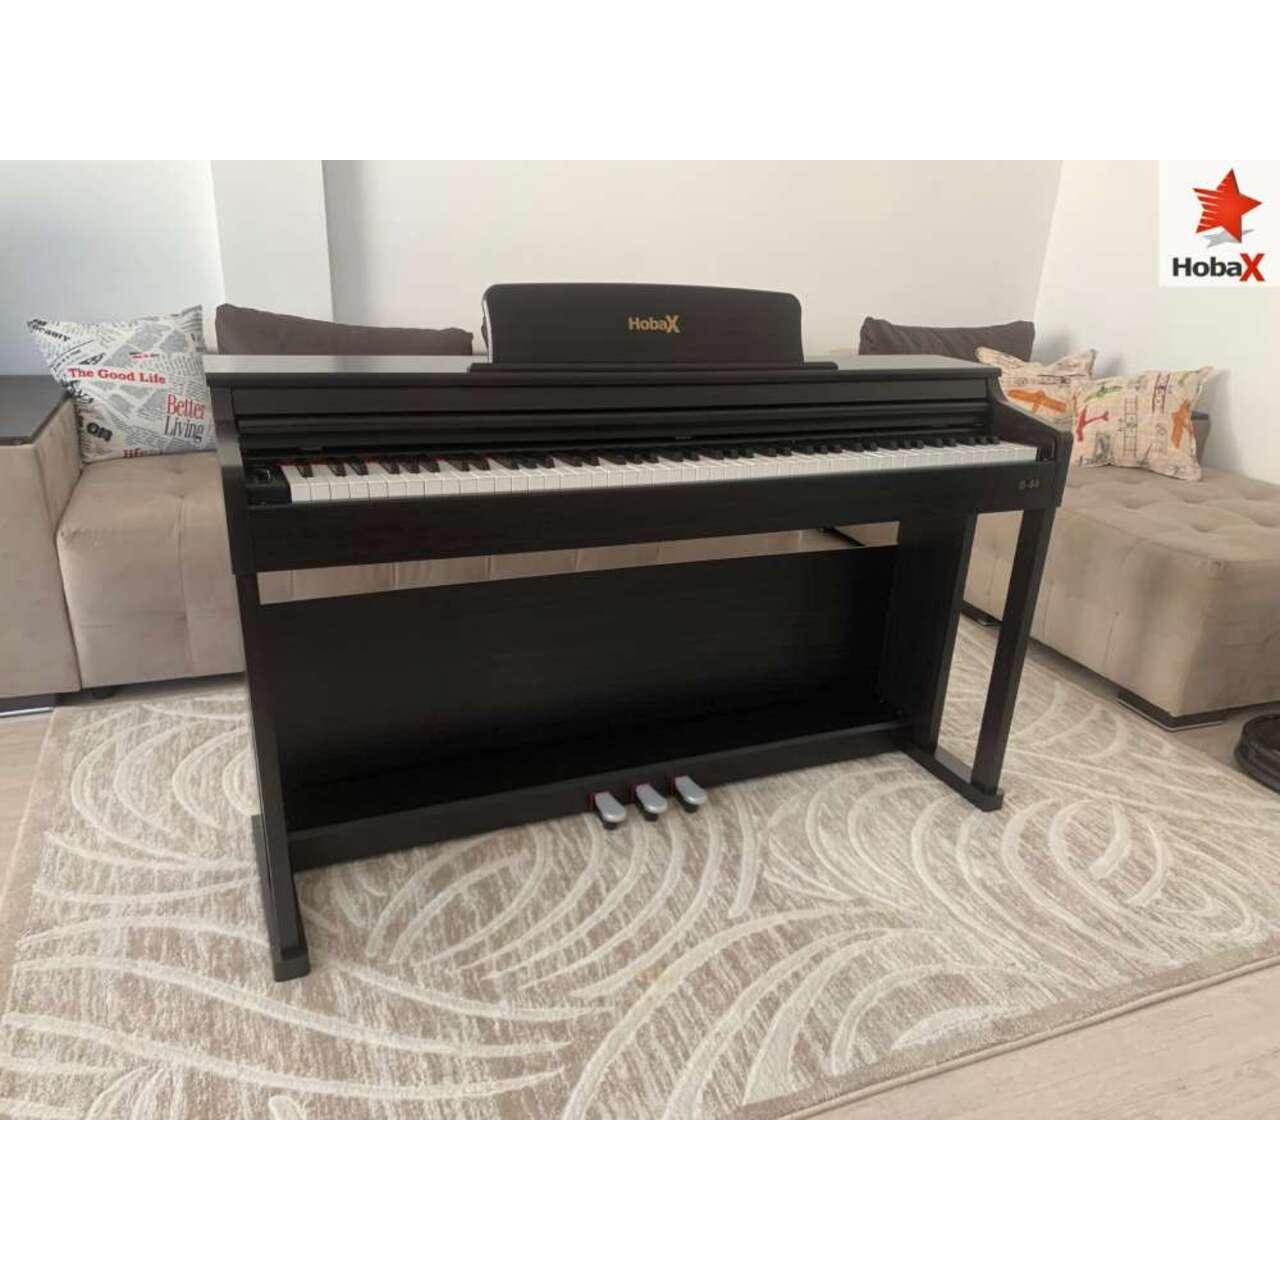 Дигитални пиано Hobax B-88, матиран Палисандър цвят, HAMMER ACTION, 88 клавиша, 7 октави, слушалки